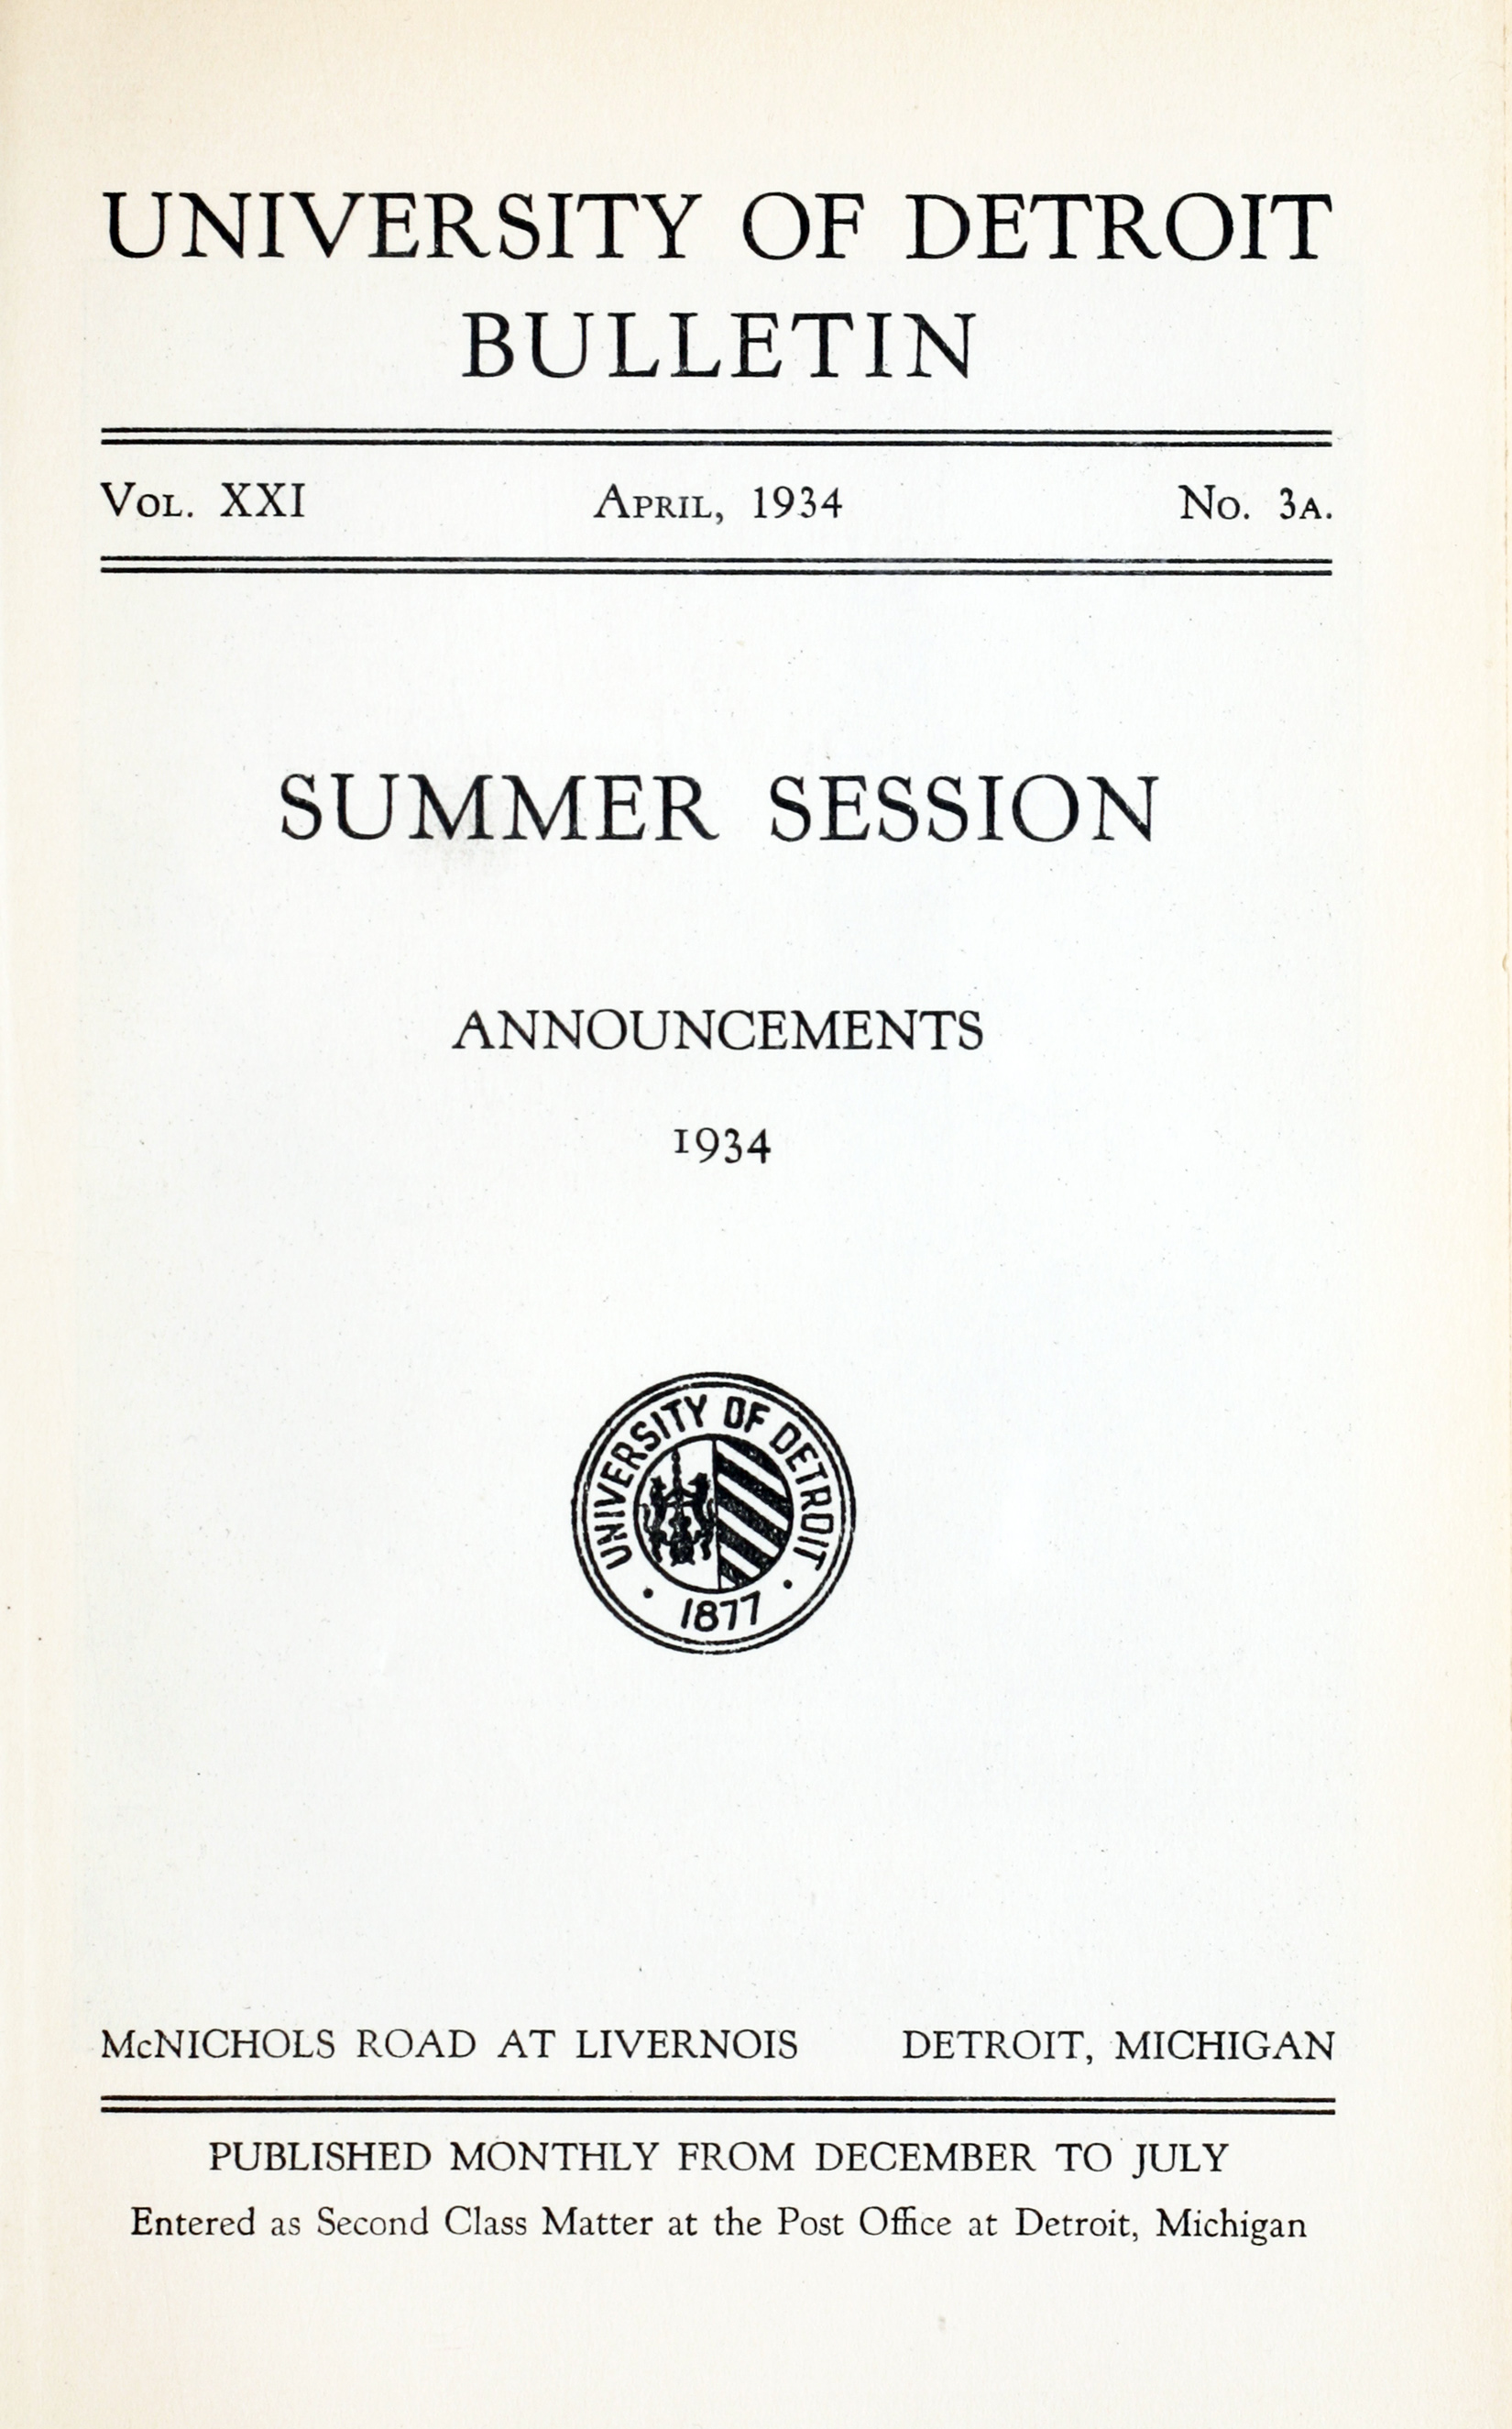 bulallsum_1934_0001